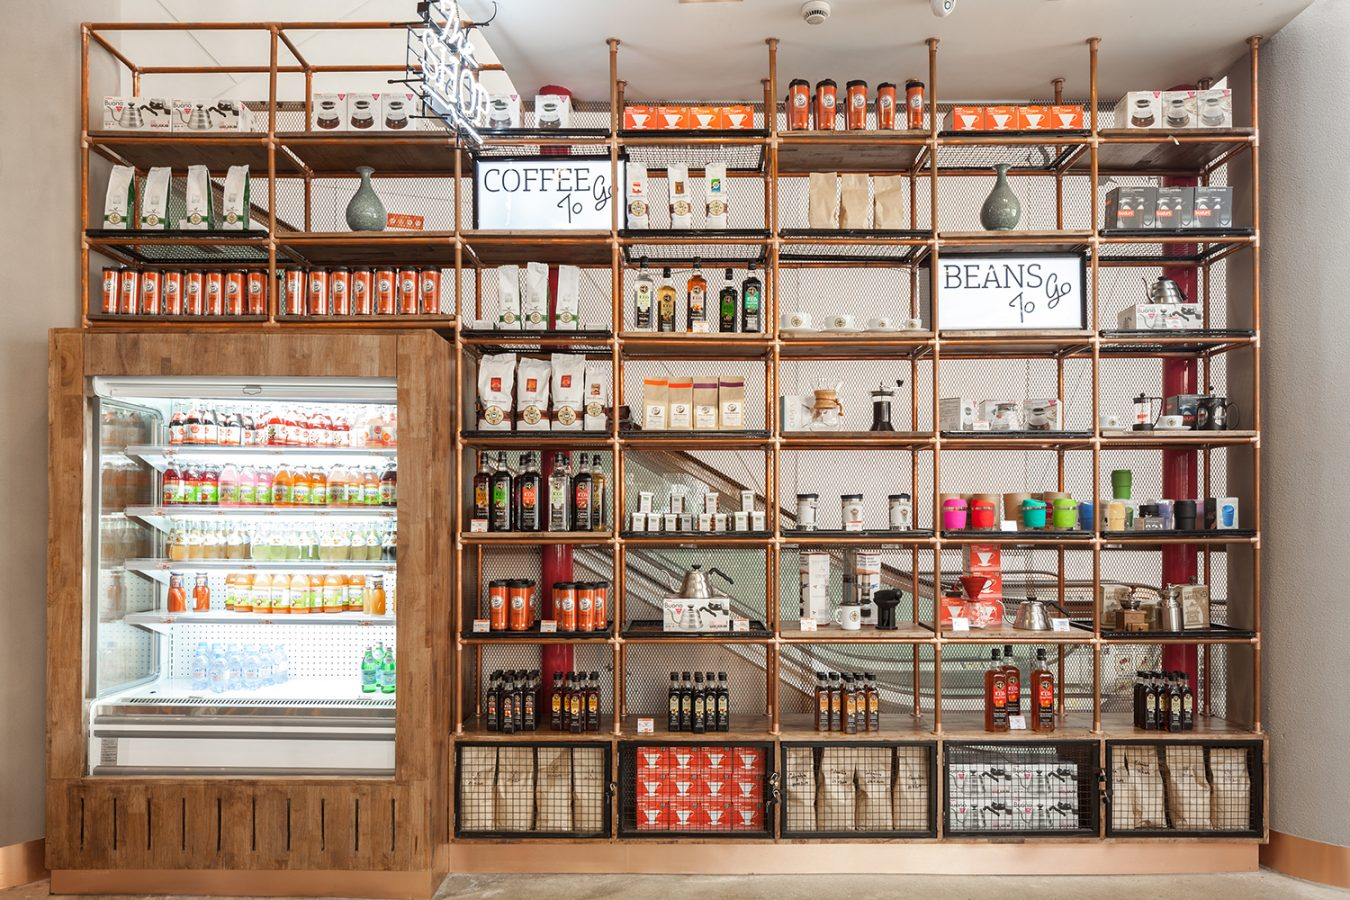 Artisan-coffee-restaurant-roastery-cafe-interior-design-urban-cool-china-copper